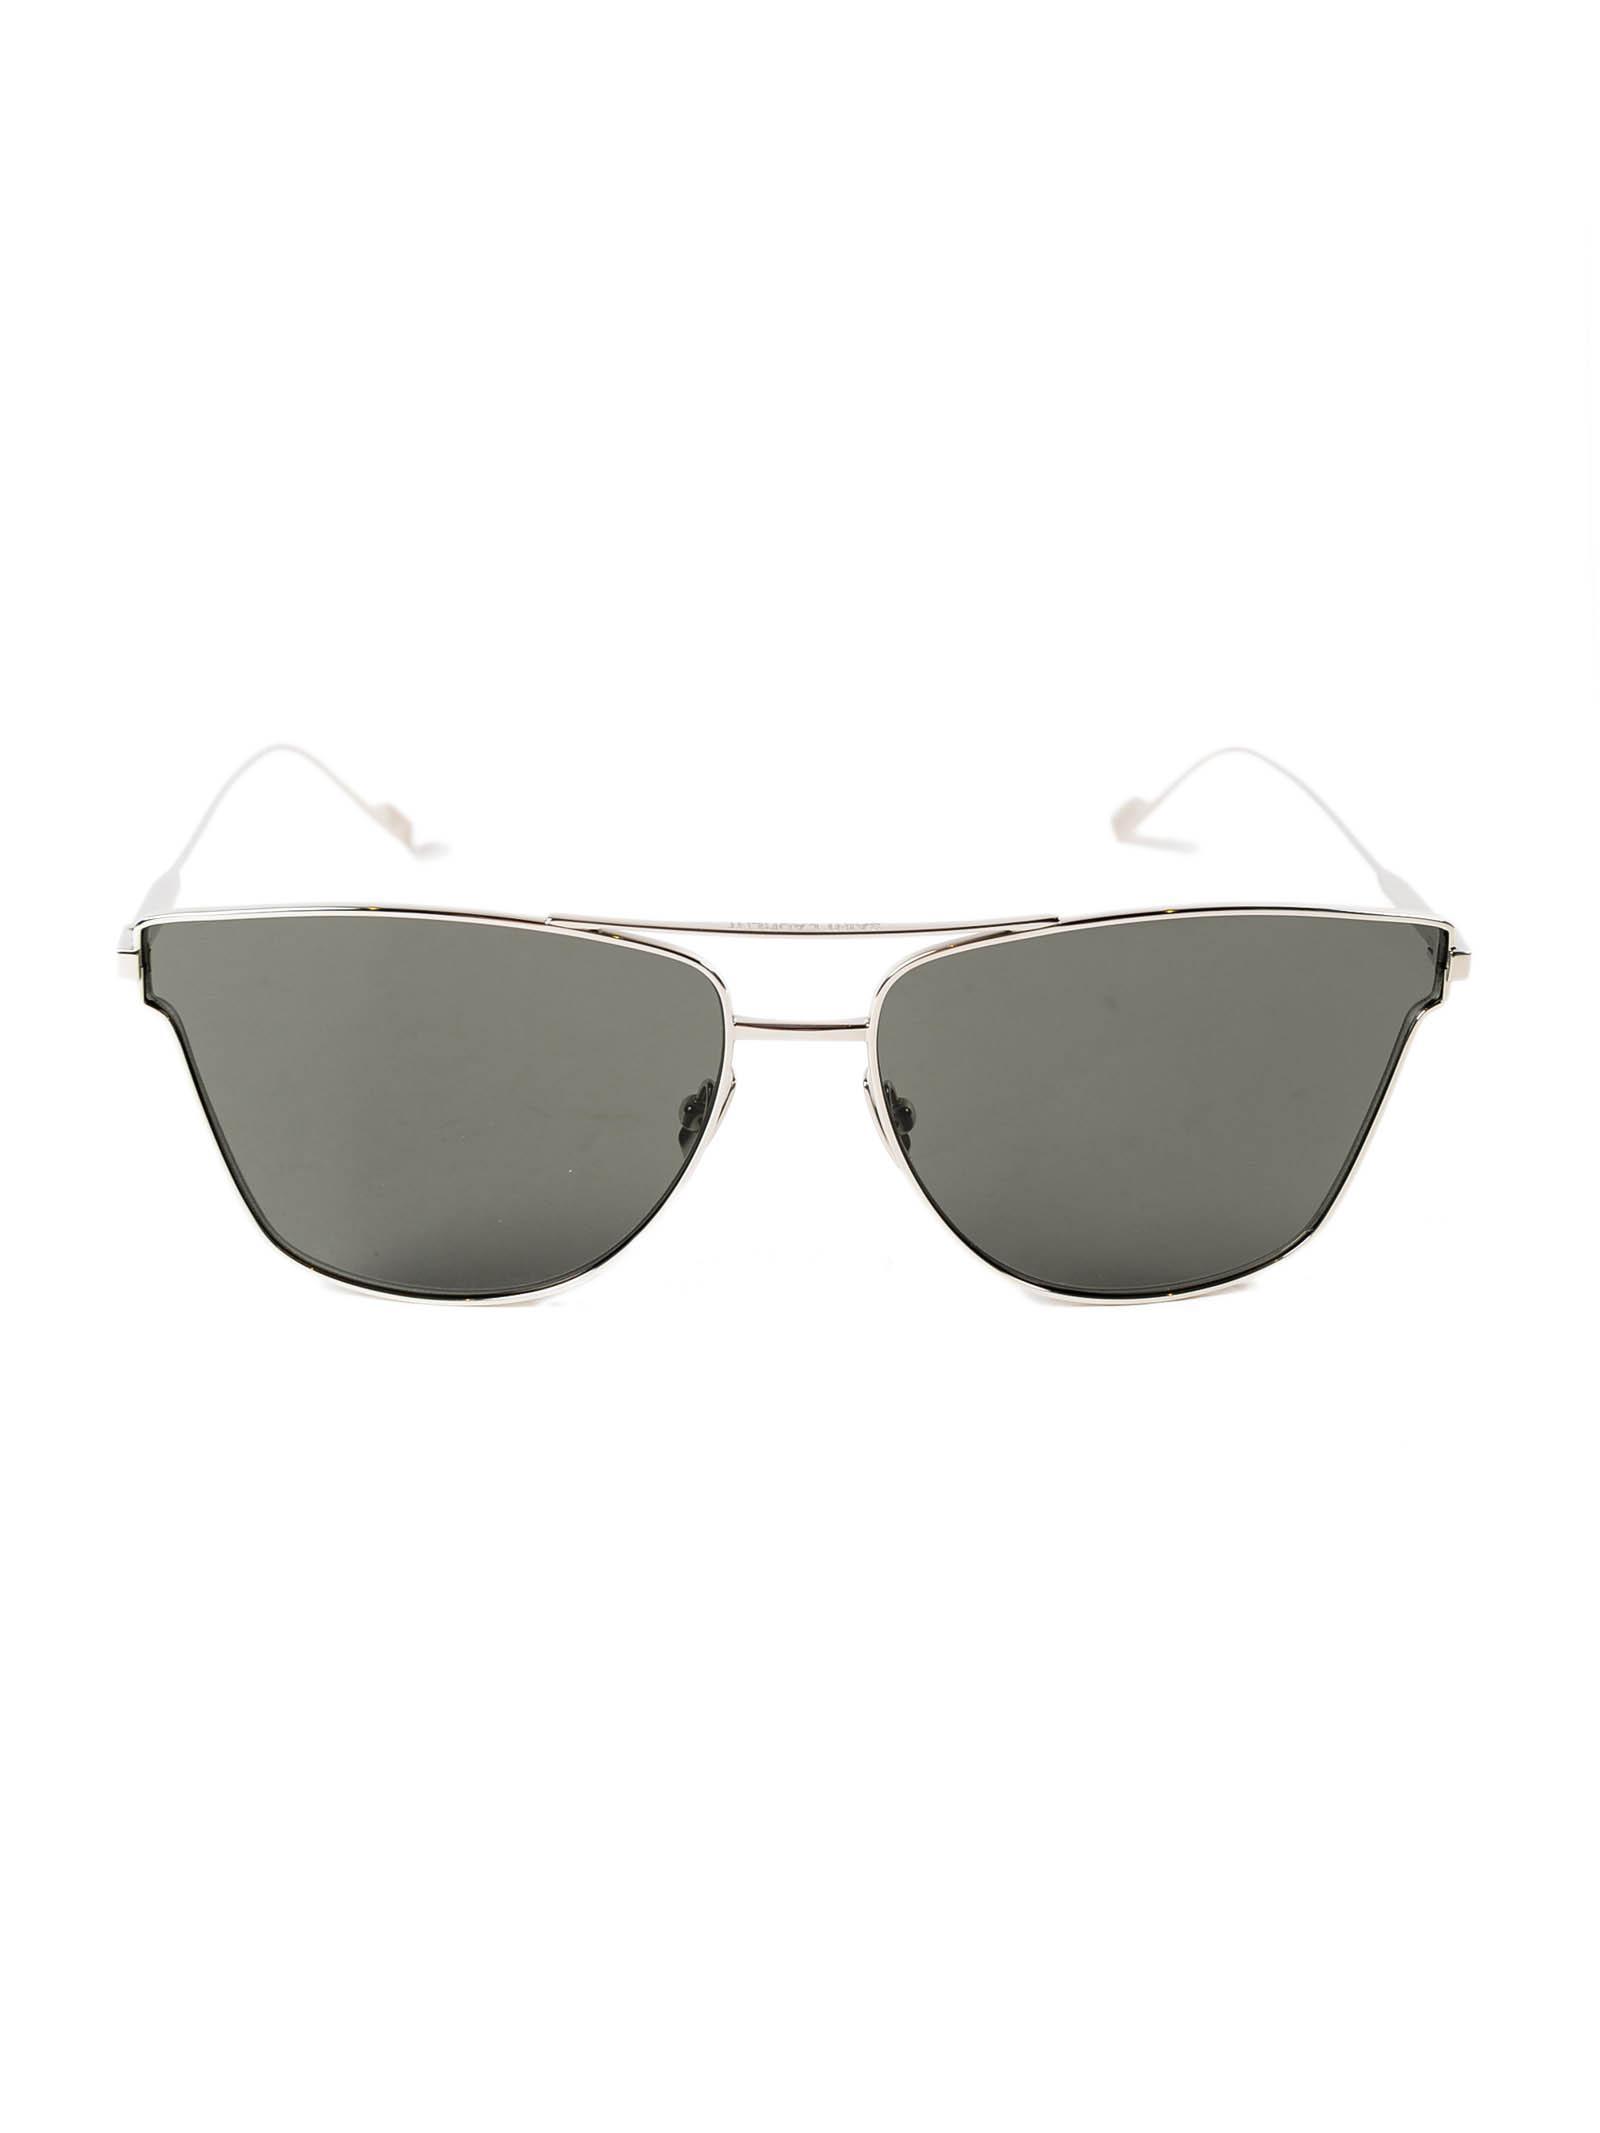 a1a4556d3d6b Saint Laurent Classic Sl51 Titanium Sunglasses in Gray for Men - Lyst